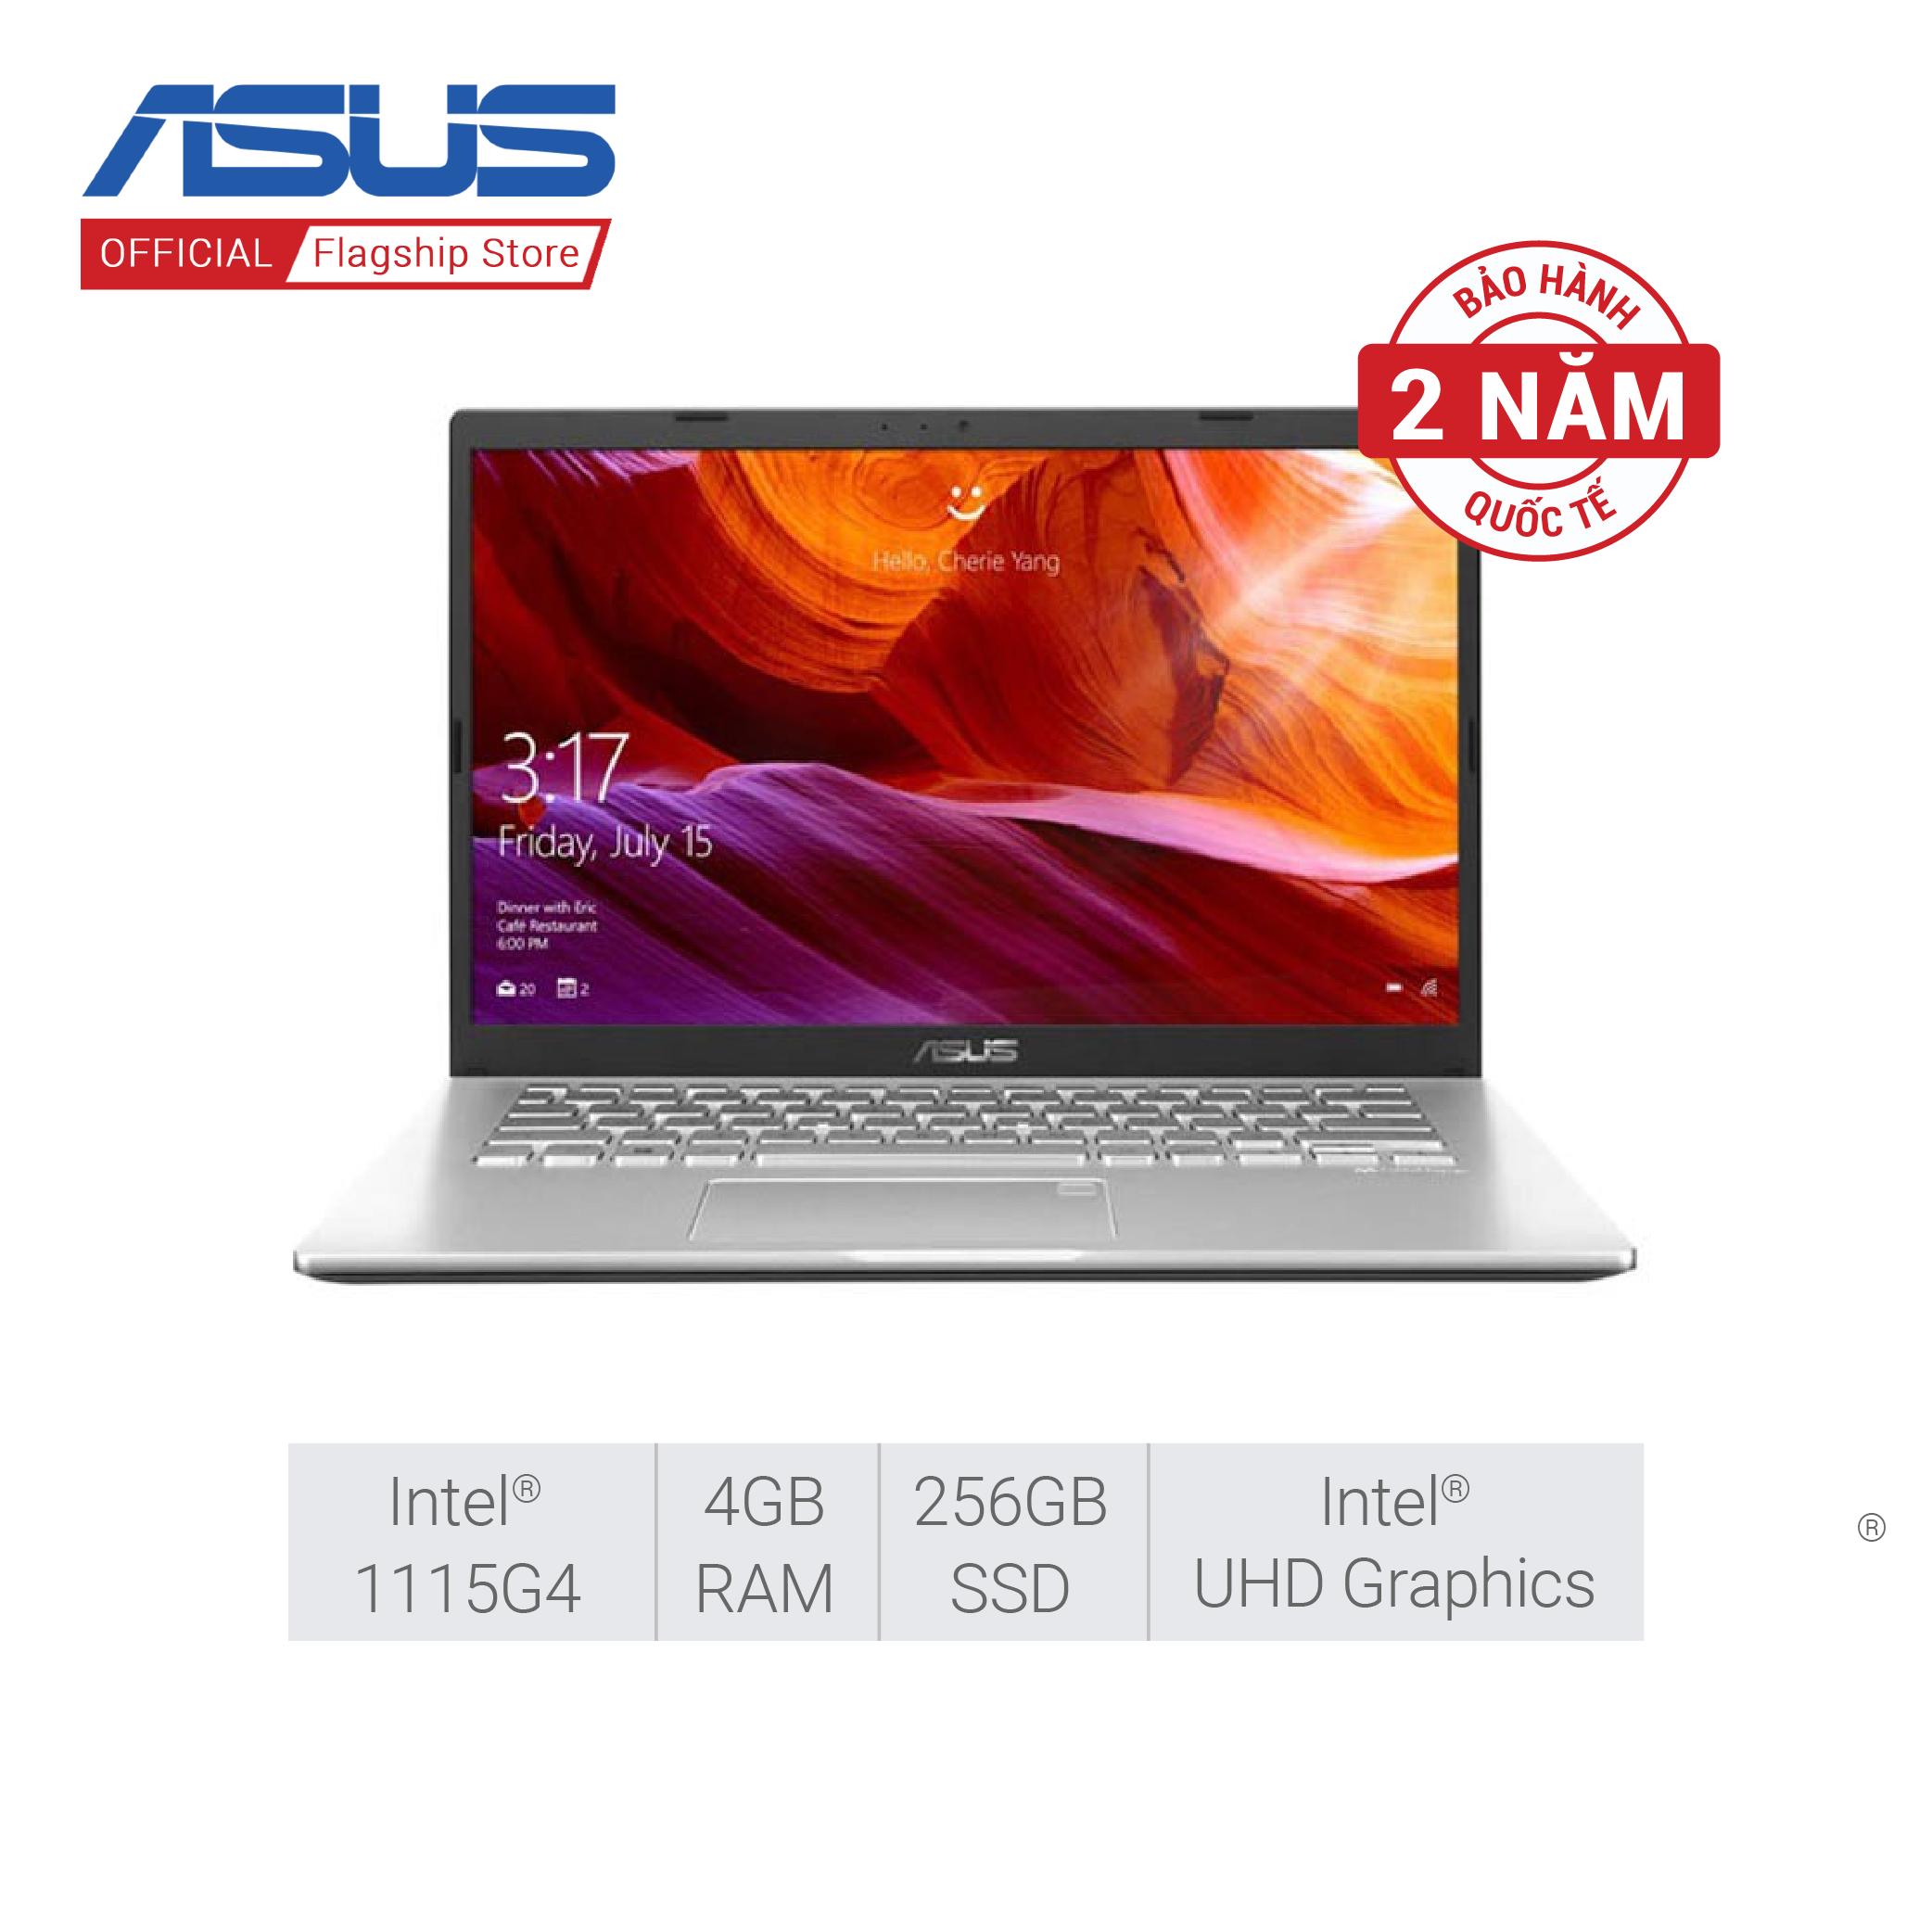 Laptop ASUS X415EA-EK047T i3-1115G4 | 4GB | 256GB SSD | Intel UHD | 14.0-inch FHD | Win 10 | Bạc